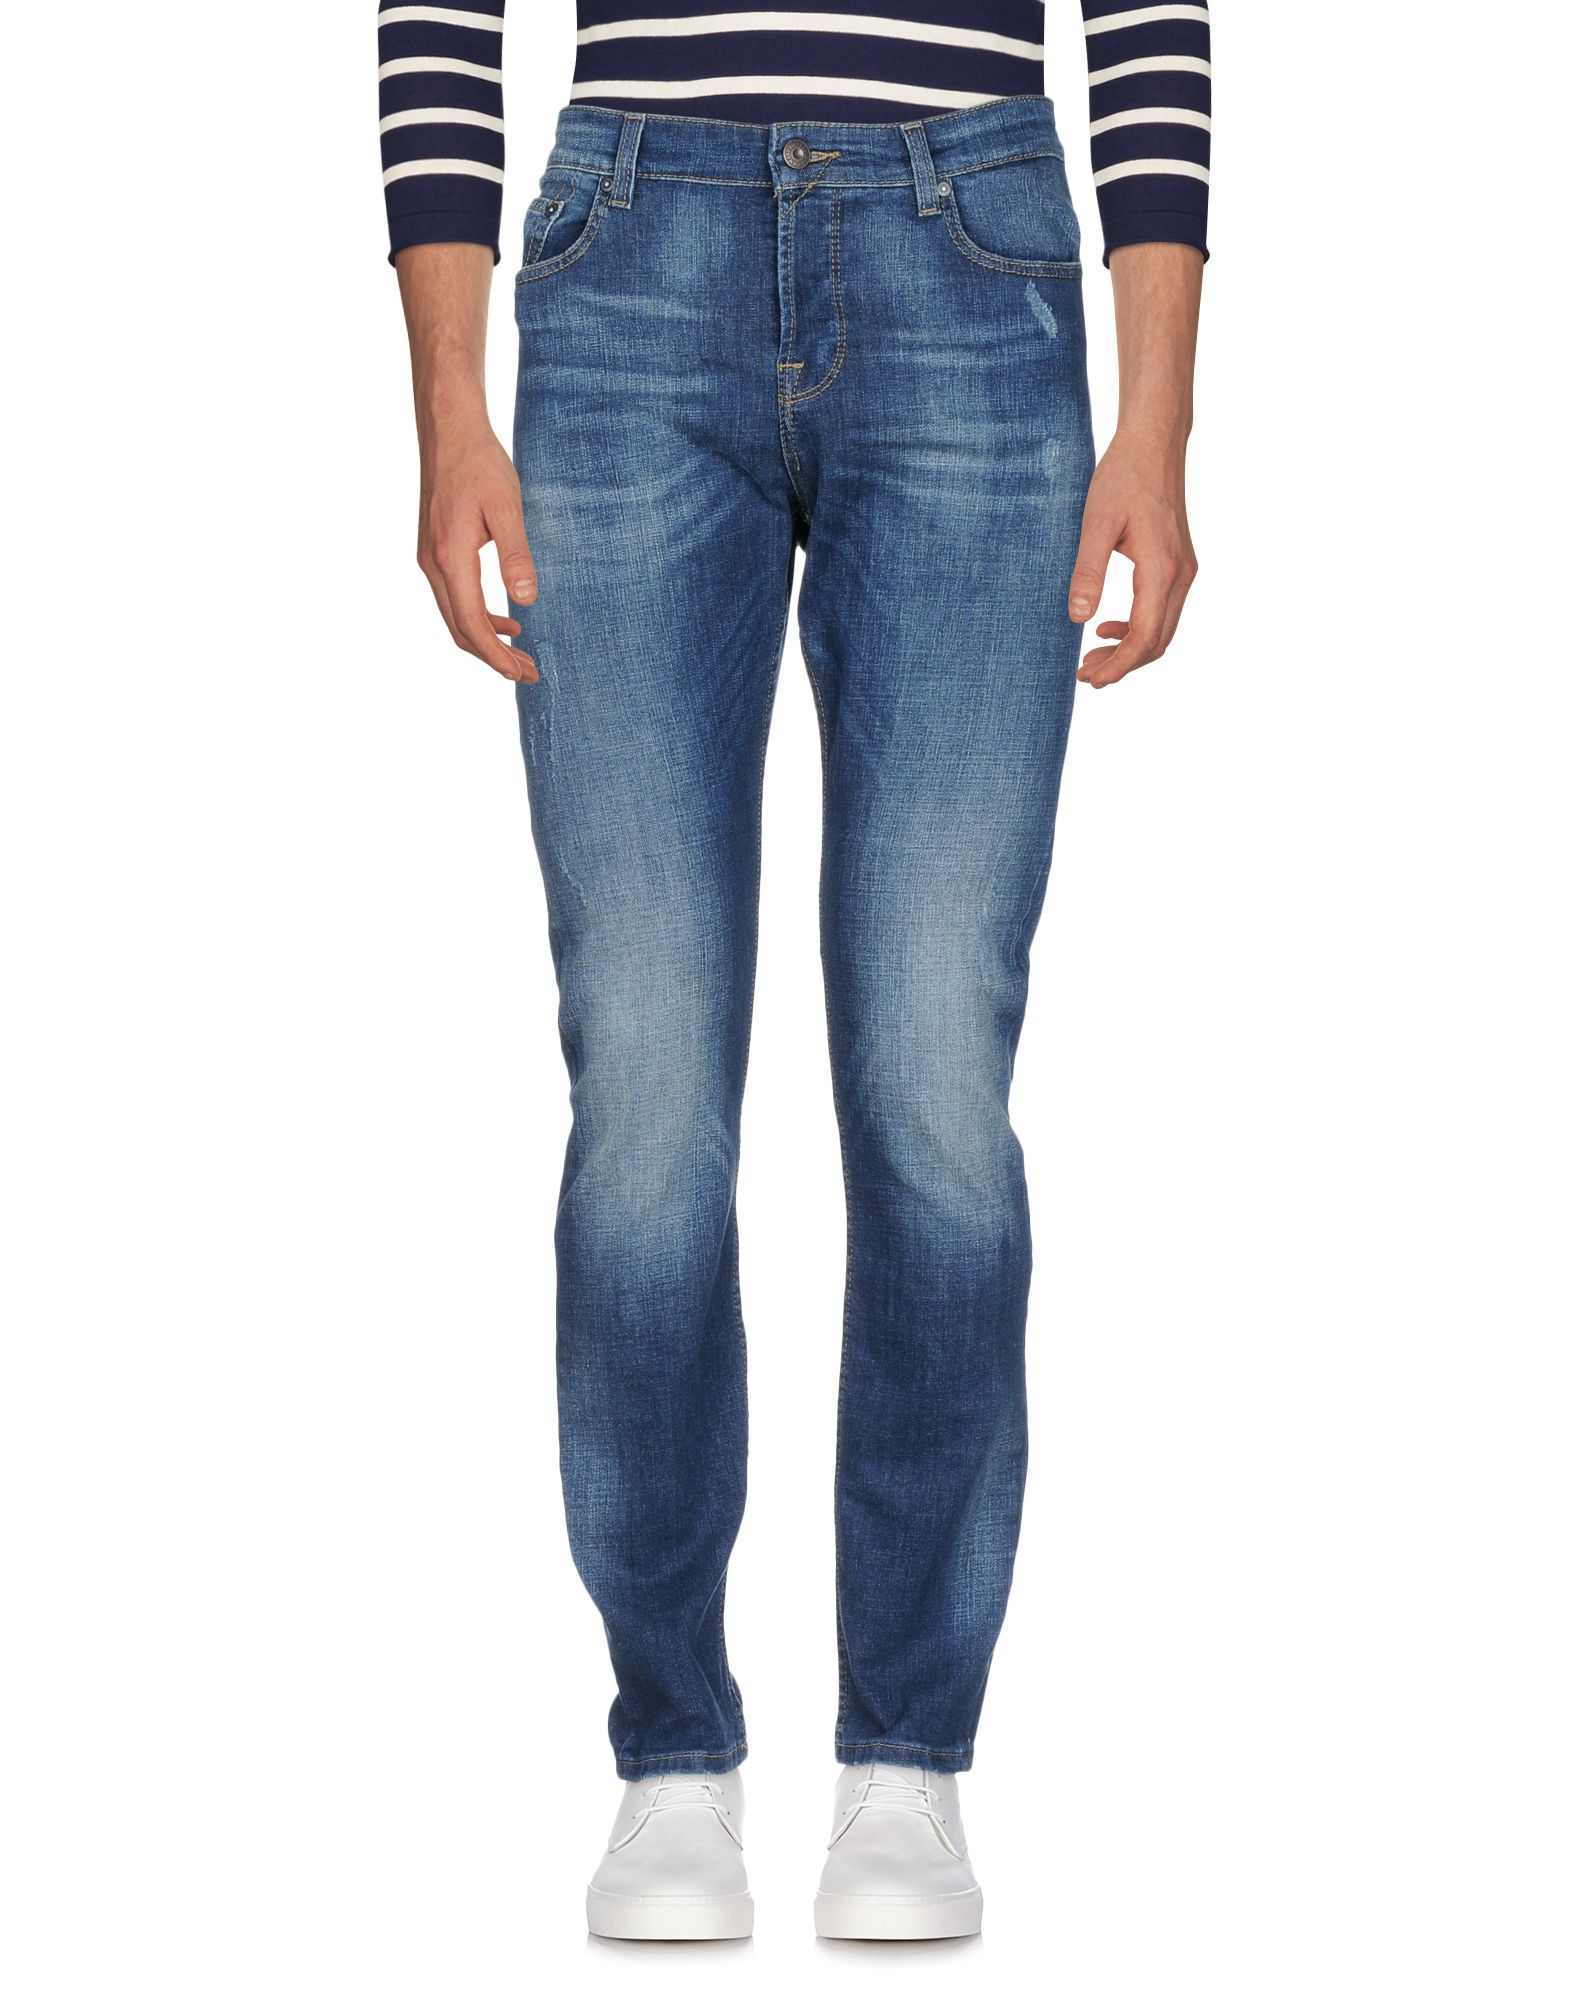 Pantaloni 42665245GI Jeans Only & Sons Uomo - 42665245GI Pantaloni 0fe0a6